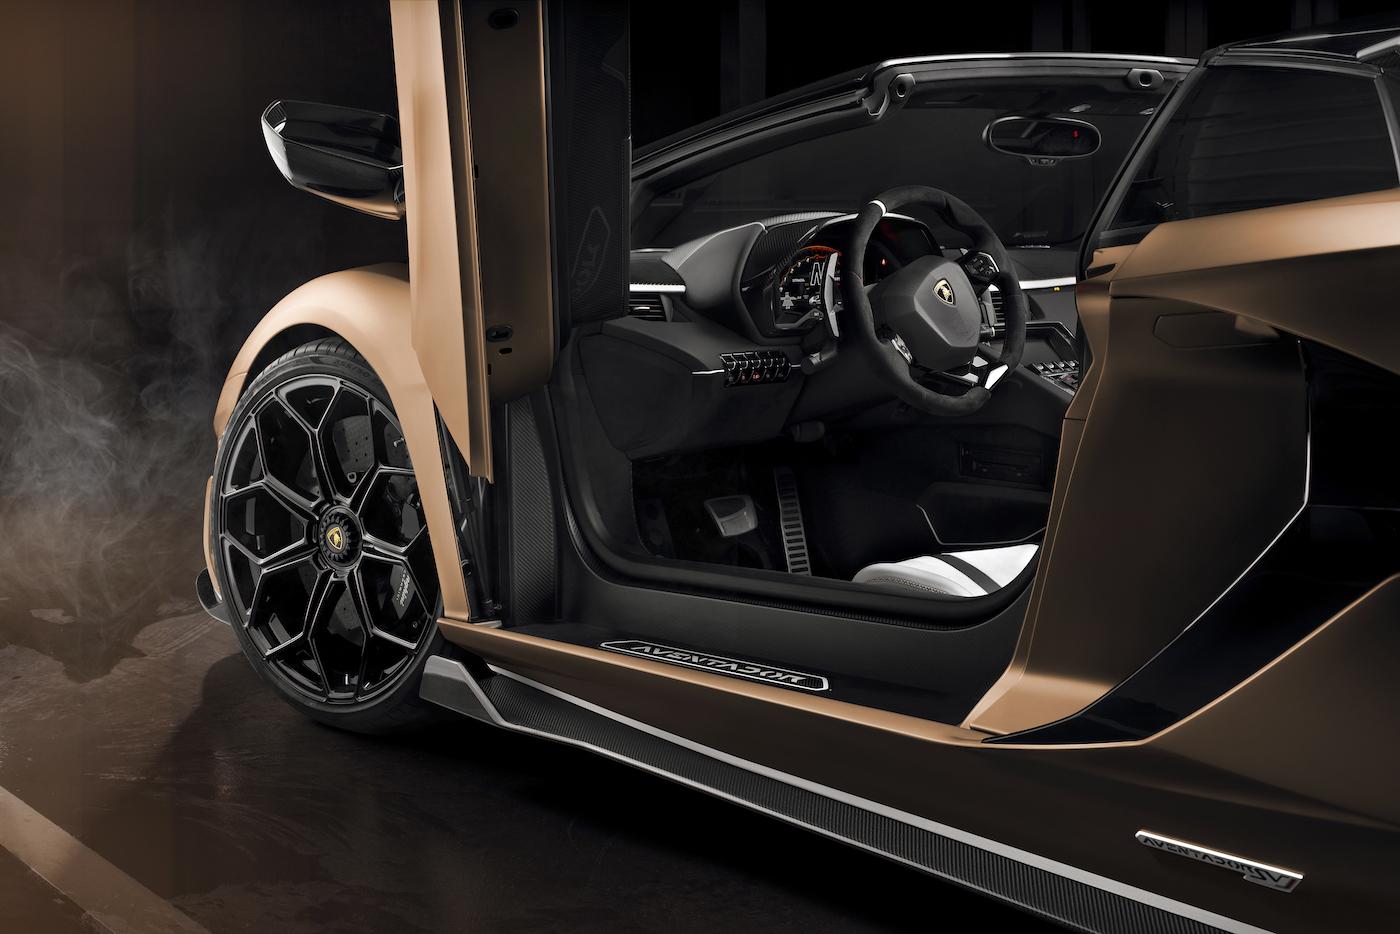 Oben ohne mit 350 km/h: Lamborghini präsentiert den Aventador SVJ Roadster in Genf 18